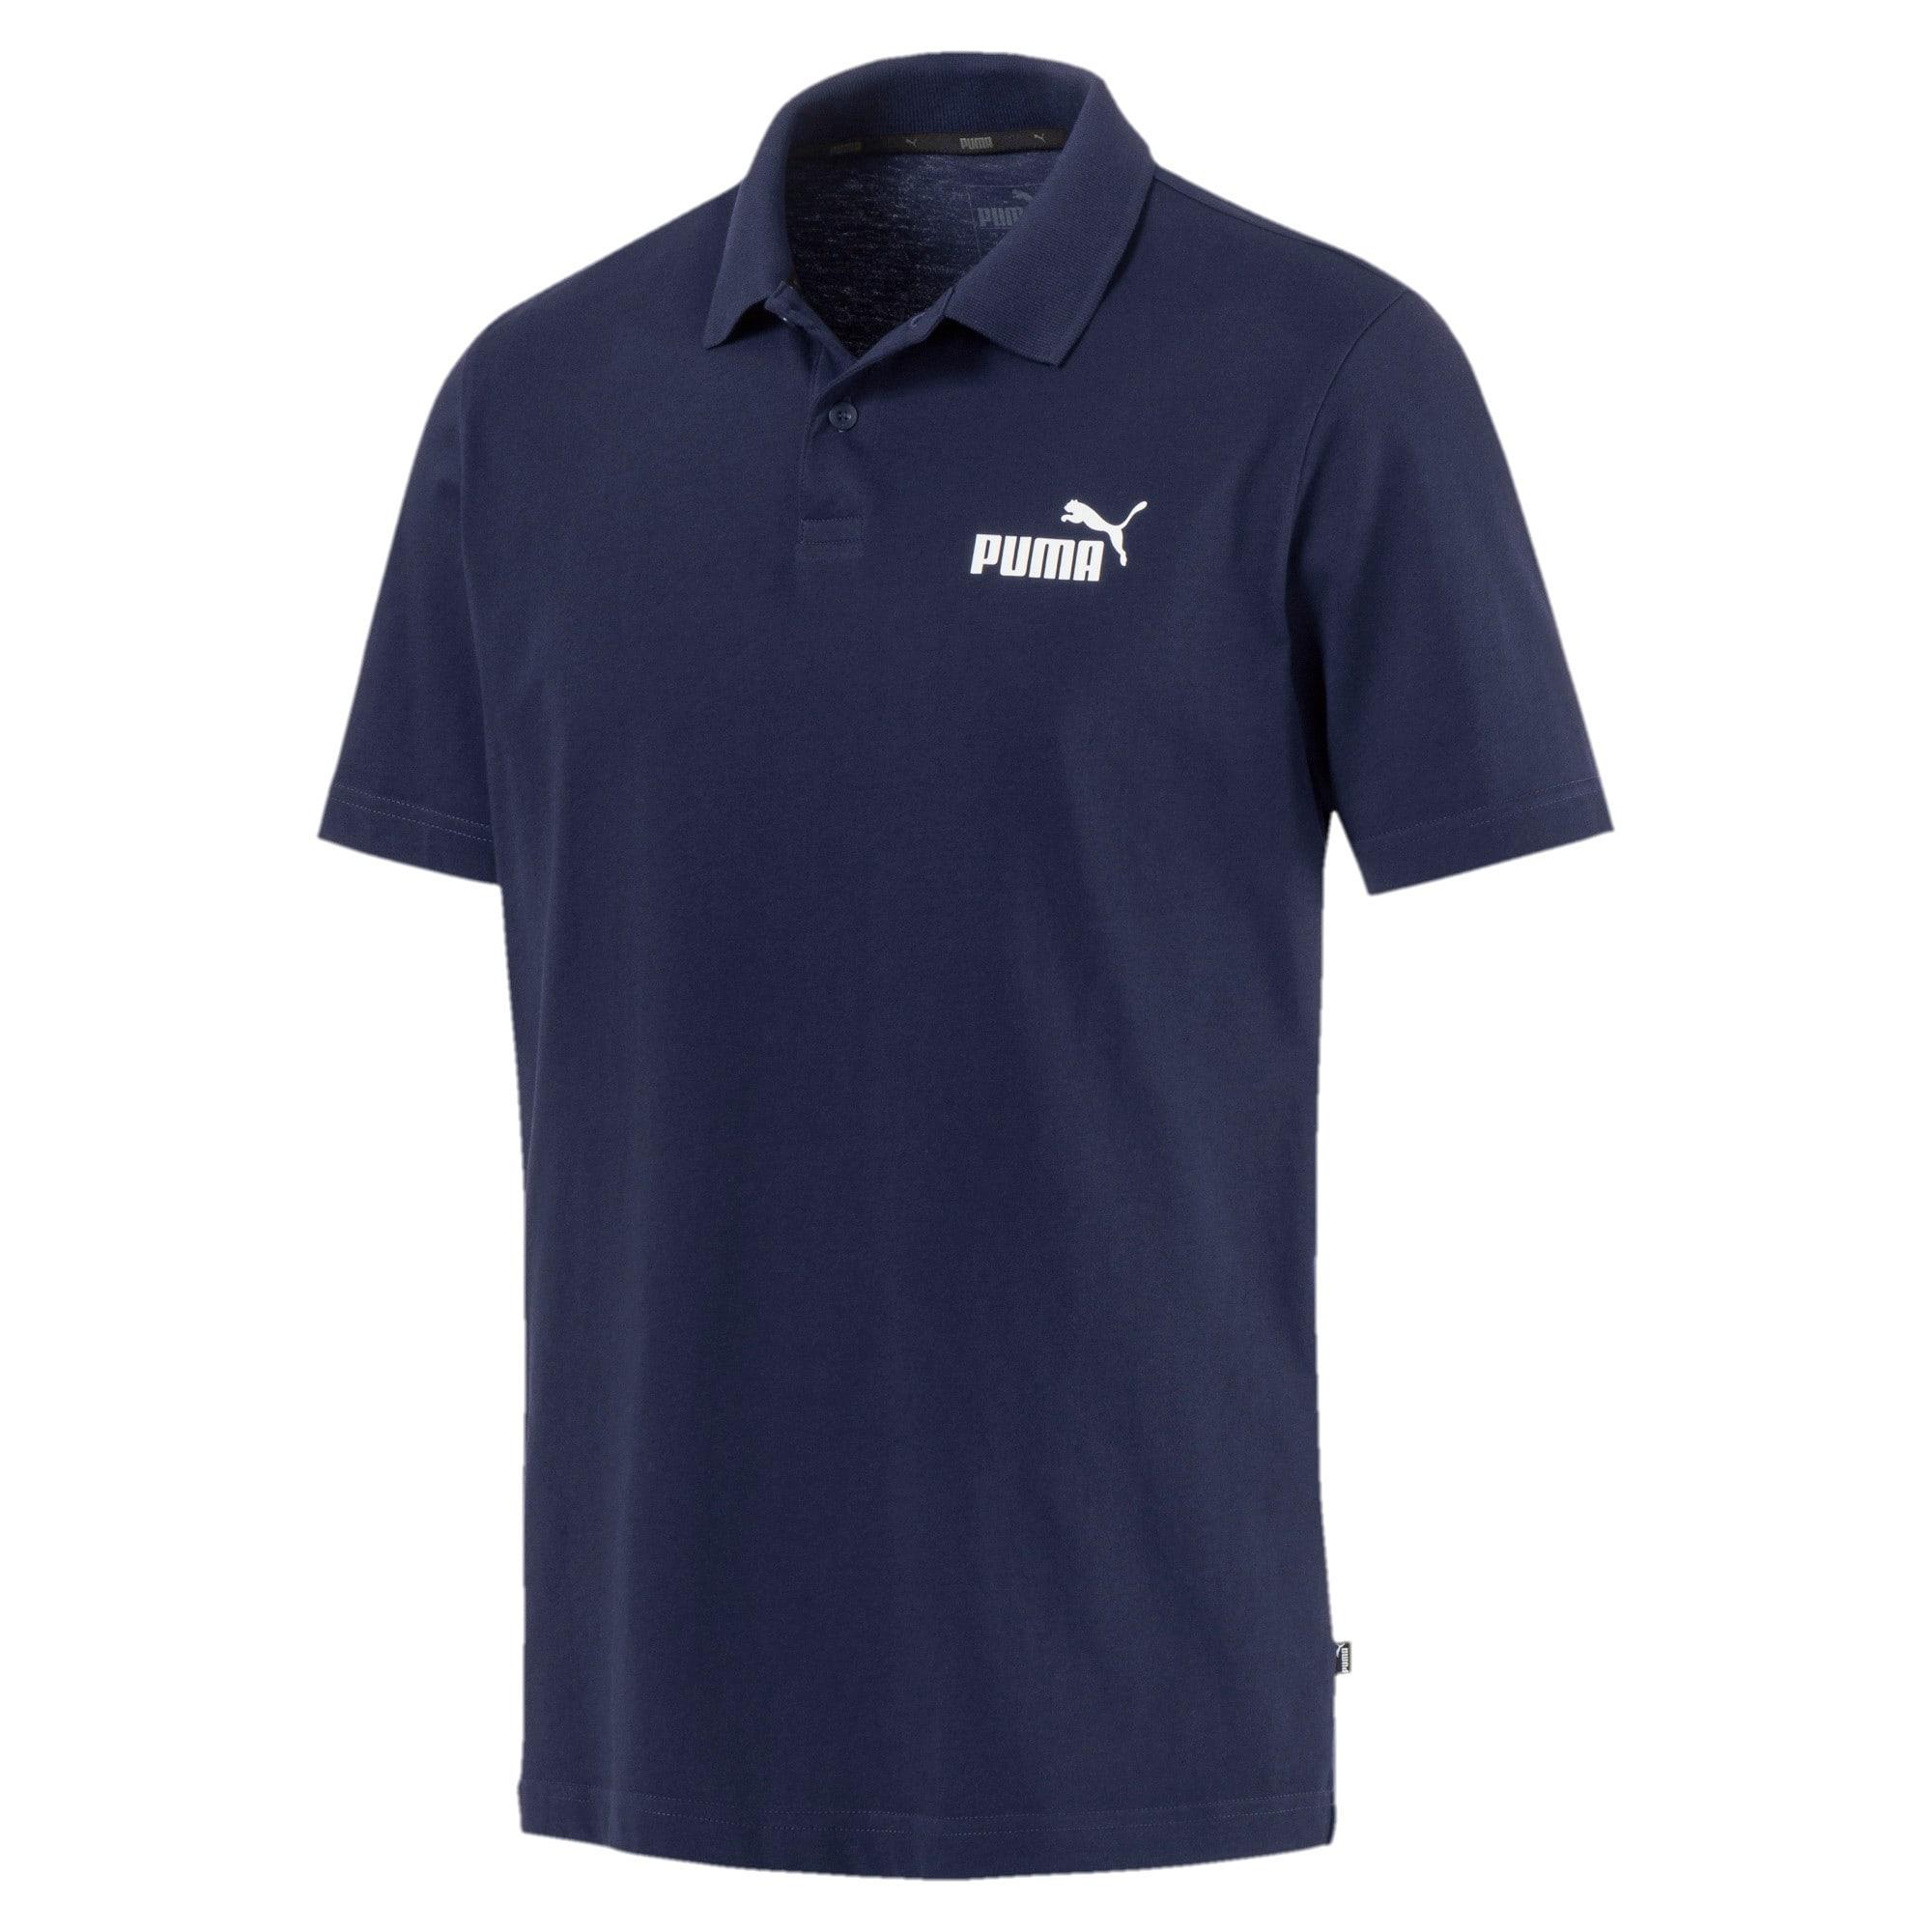 Thumbnail 4 of Polo in jersey Essentials uomo, Peacoat, medium